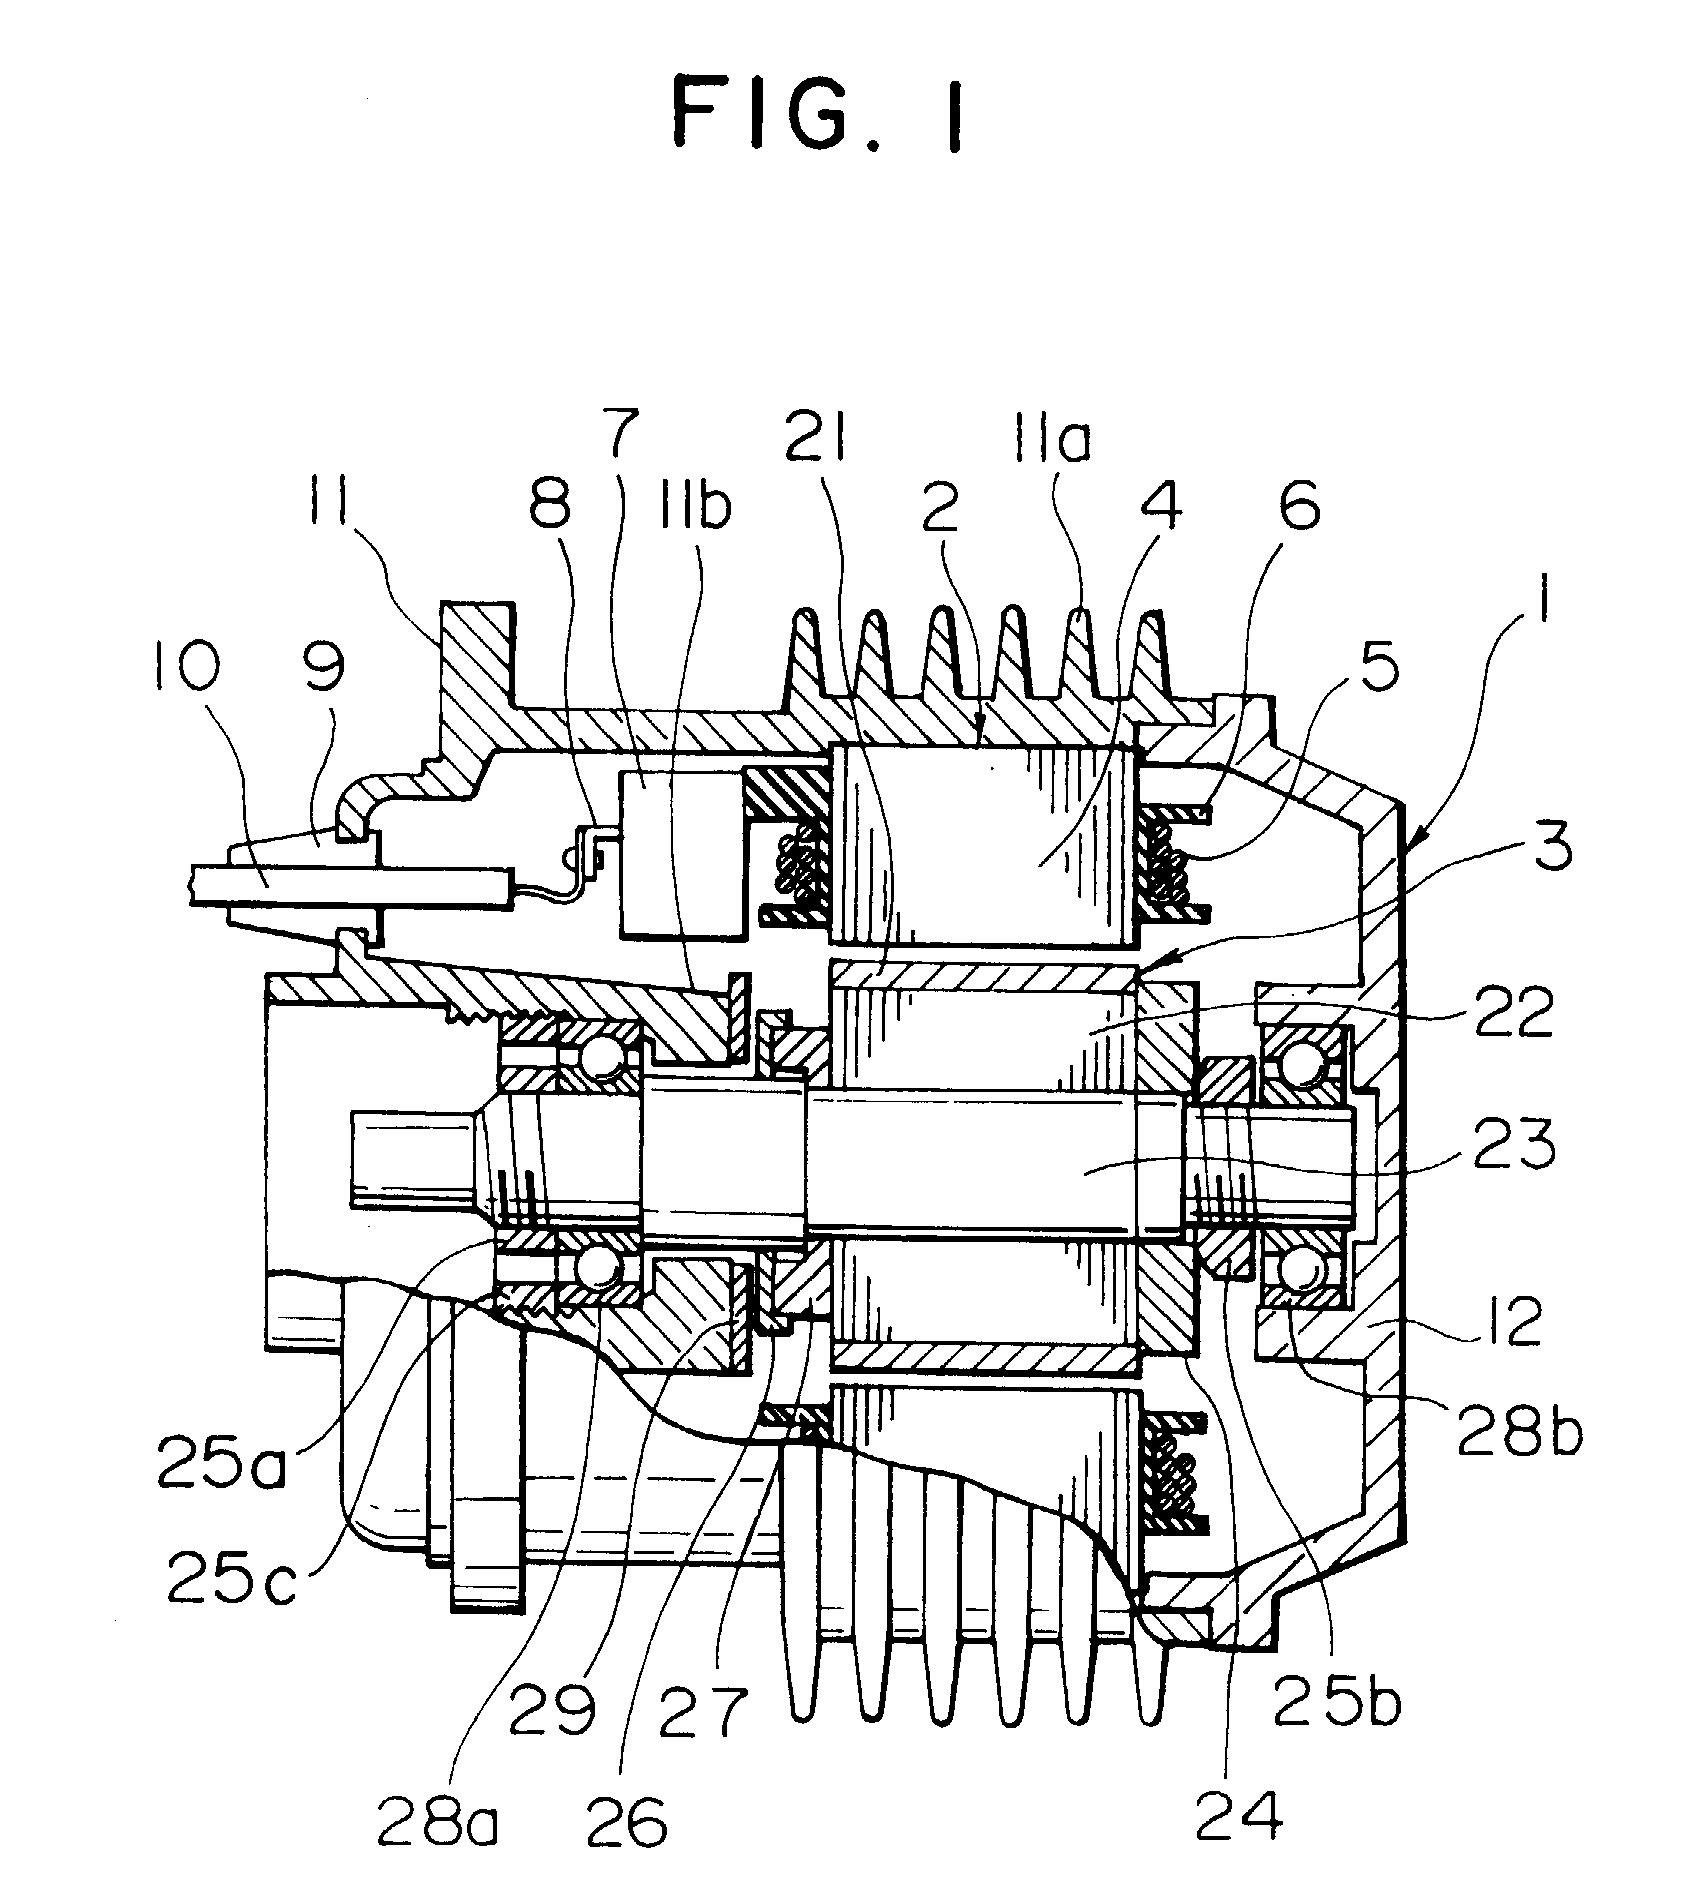 05 trx450r headlight wiring diagram best wiring librarytrx honda 450er wiring  diagram 30 wiring diagram images